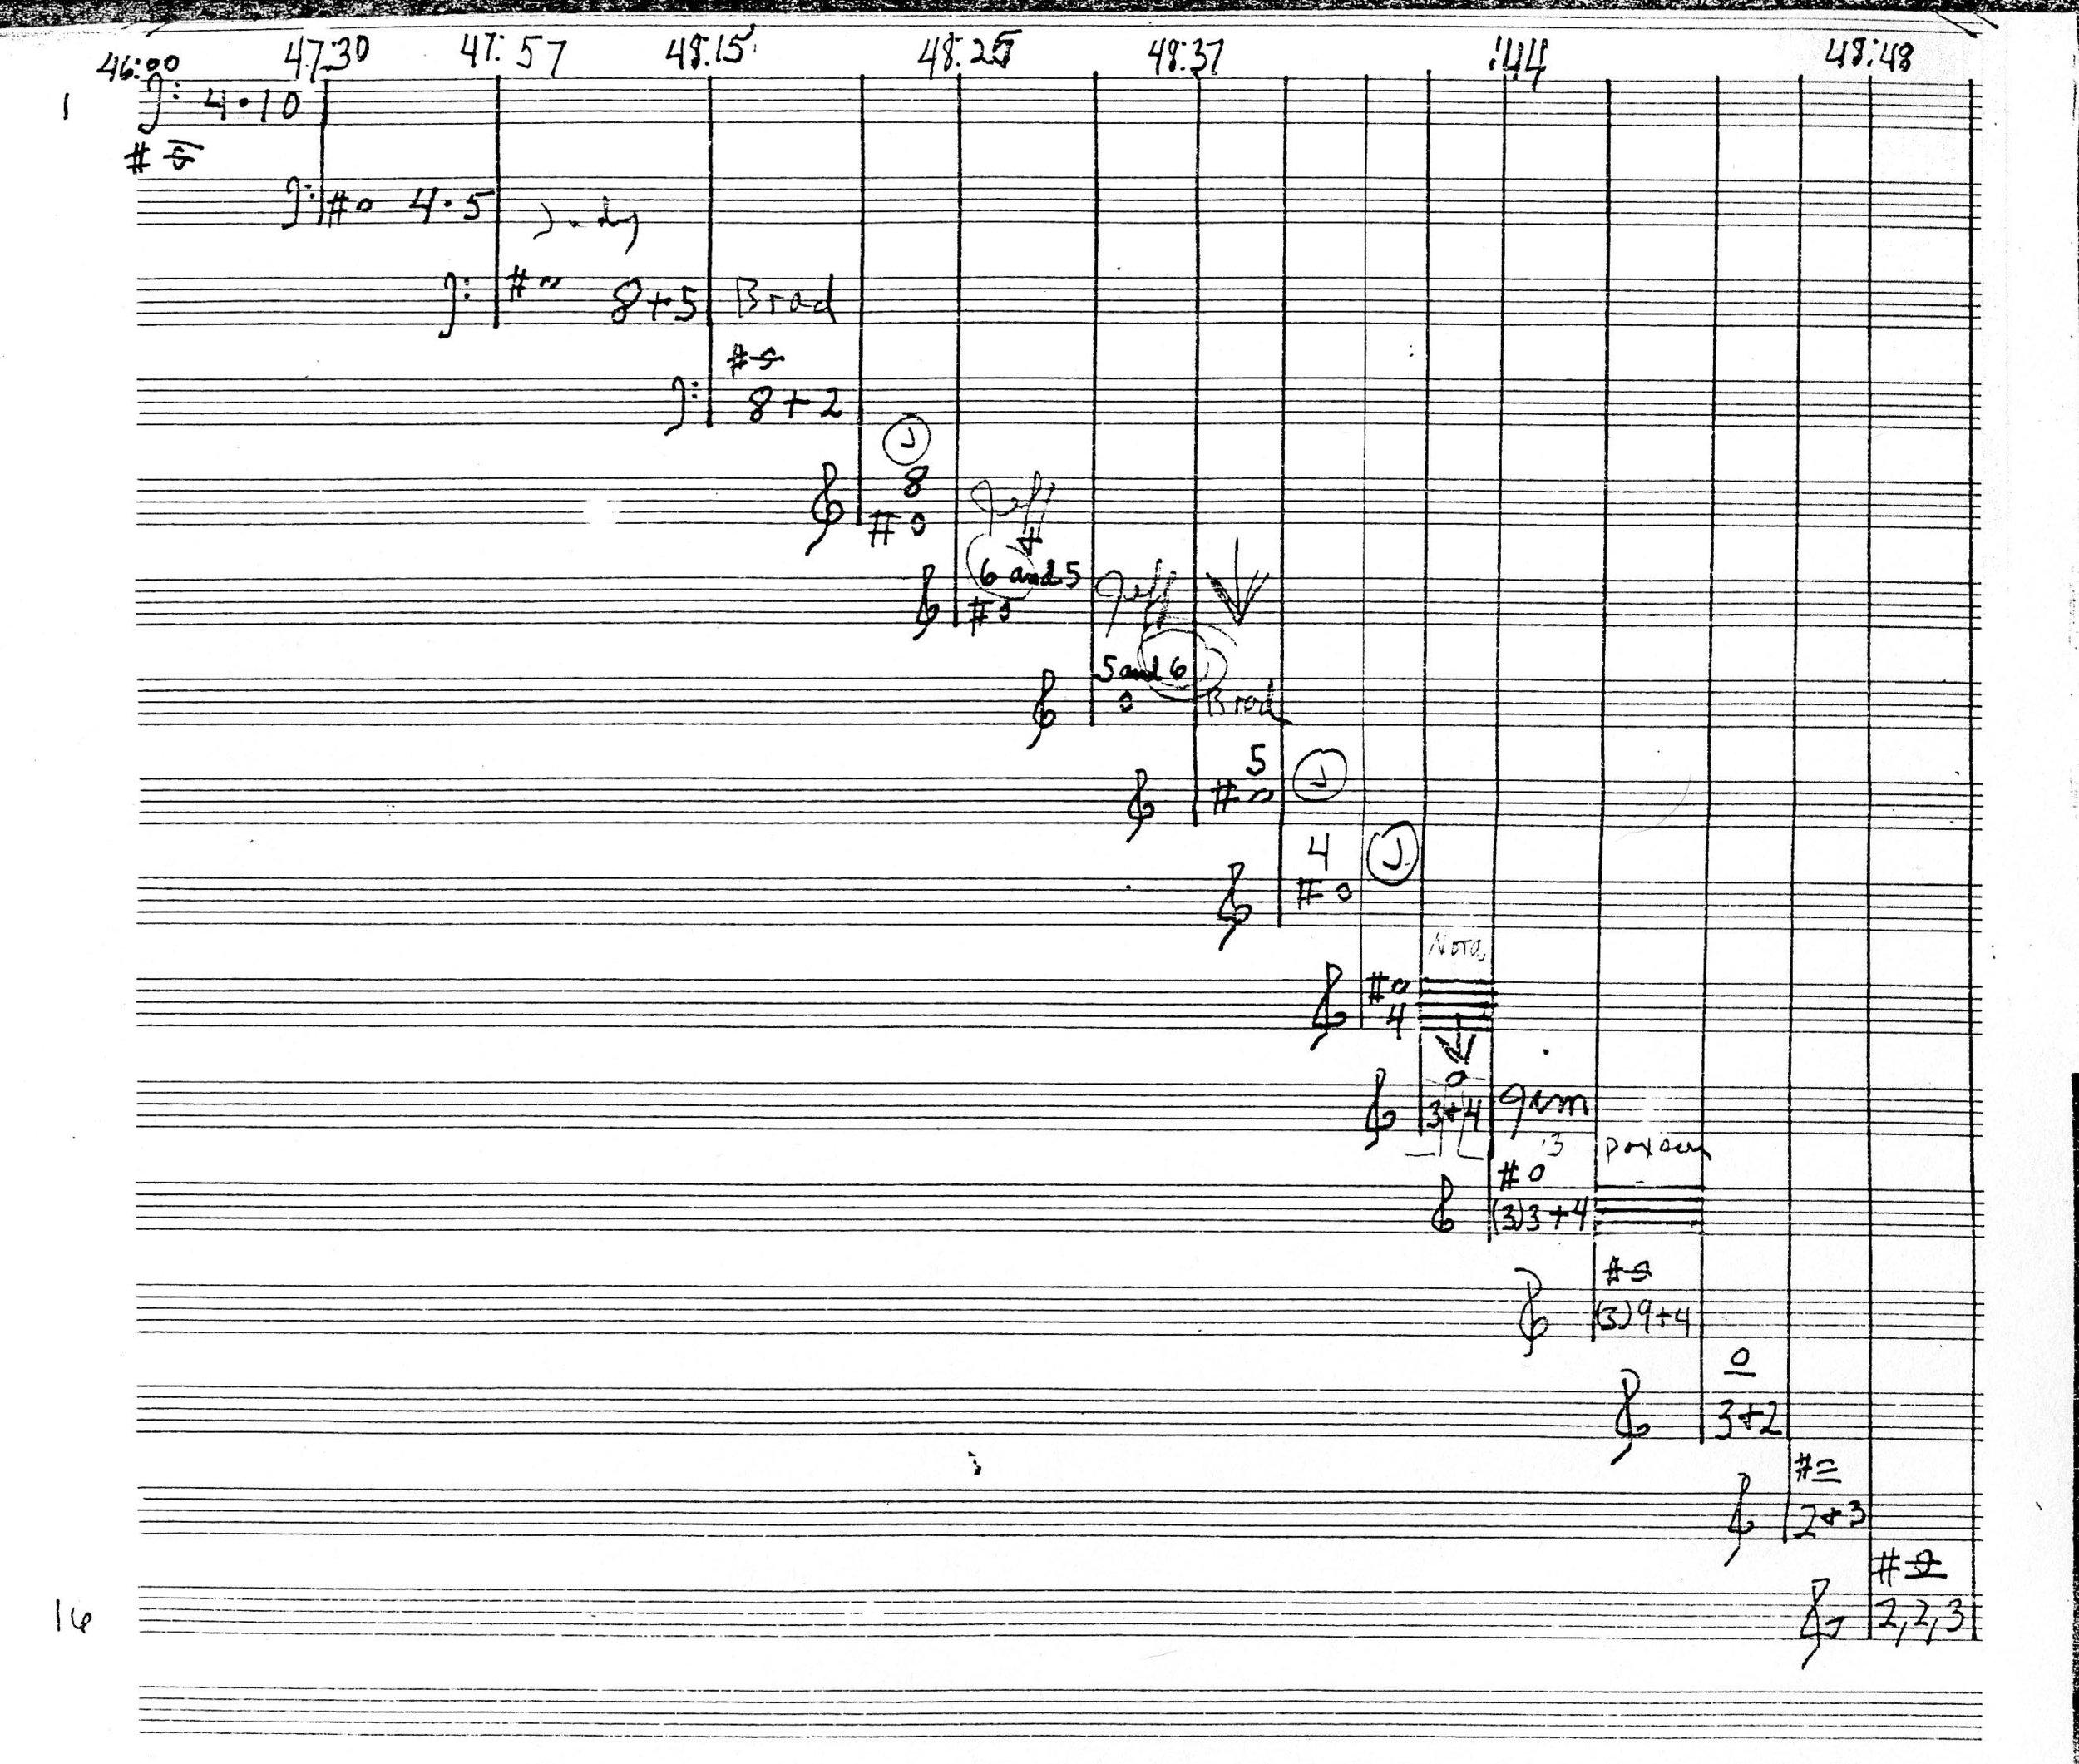 Eastman_Crazy Nigger Score Pg 13.jpg